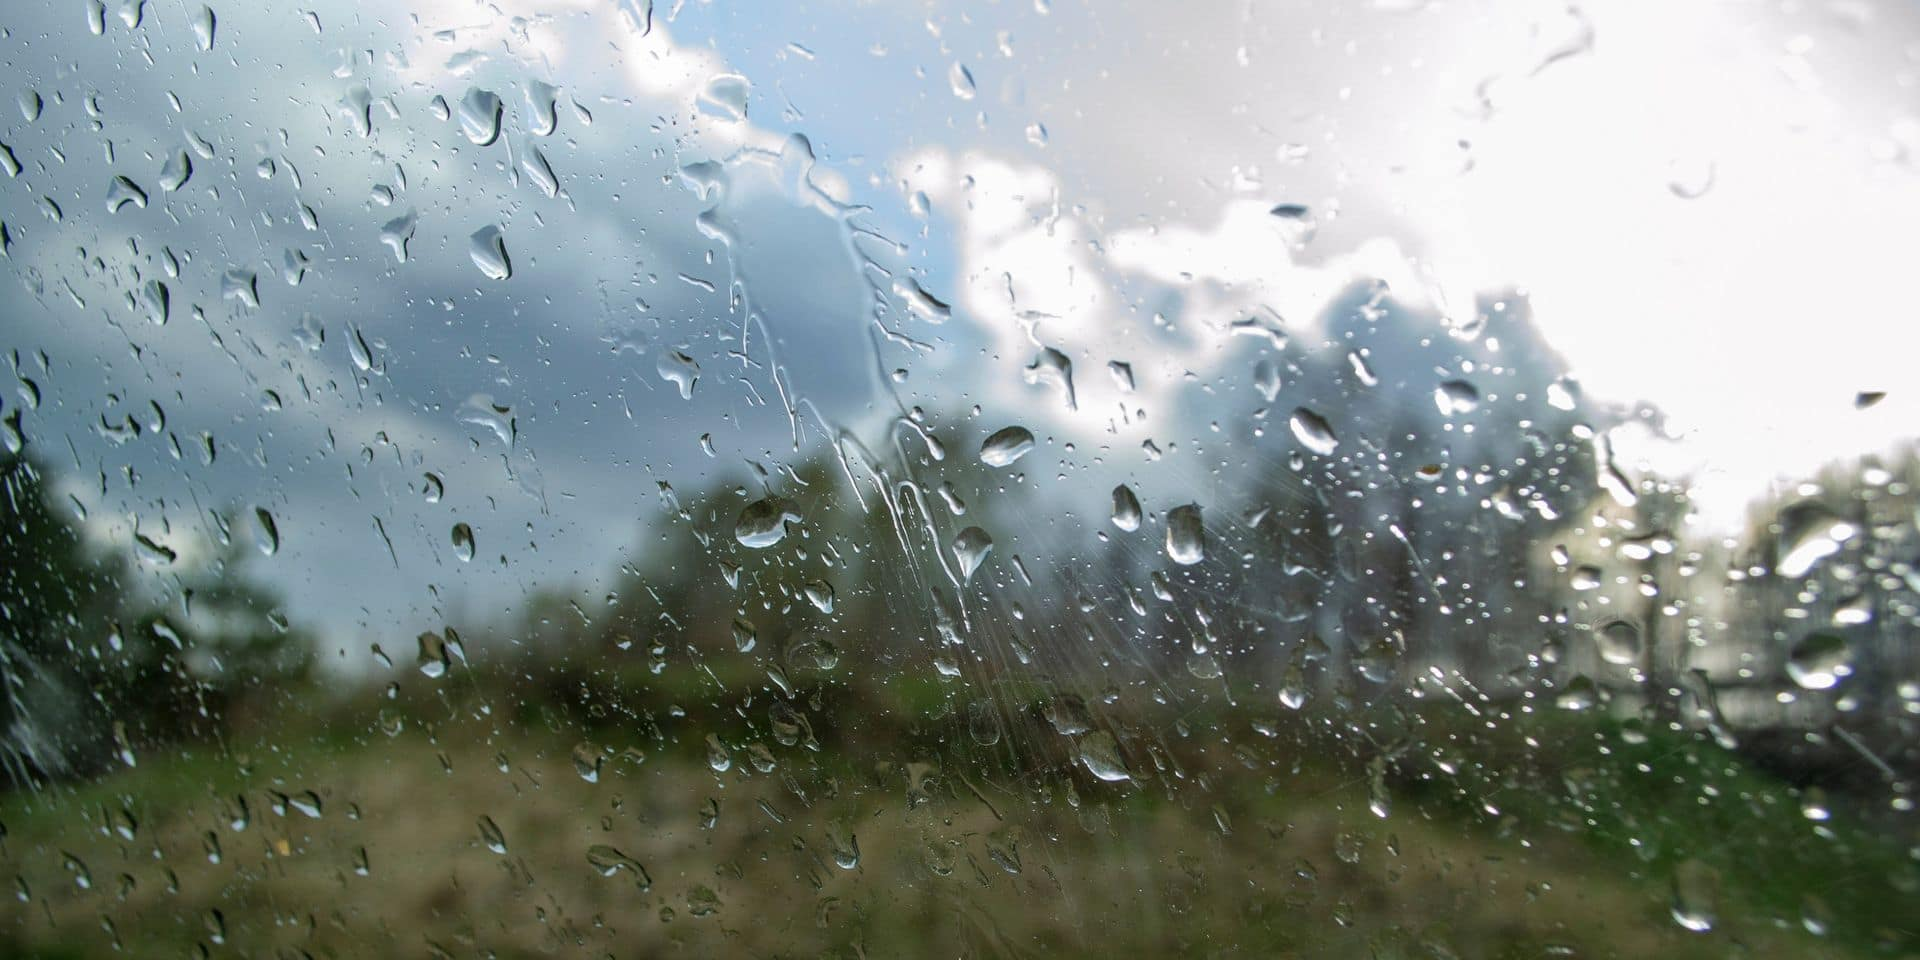 Météo: un peu de pluie et jusqu'à 21° ce samedi